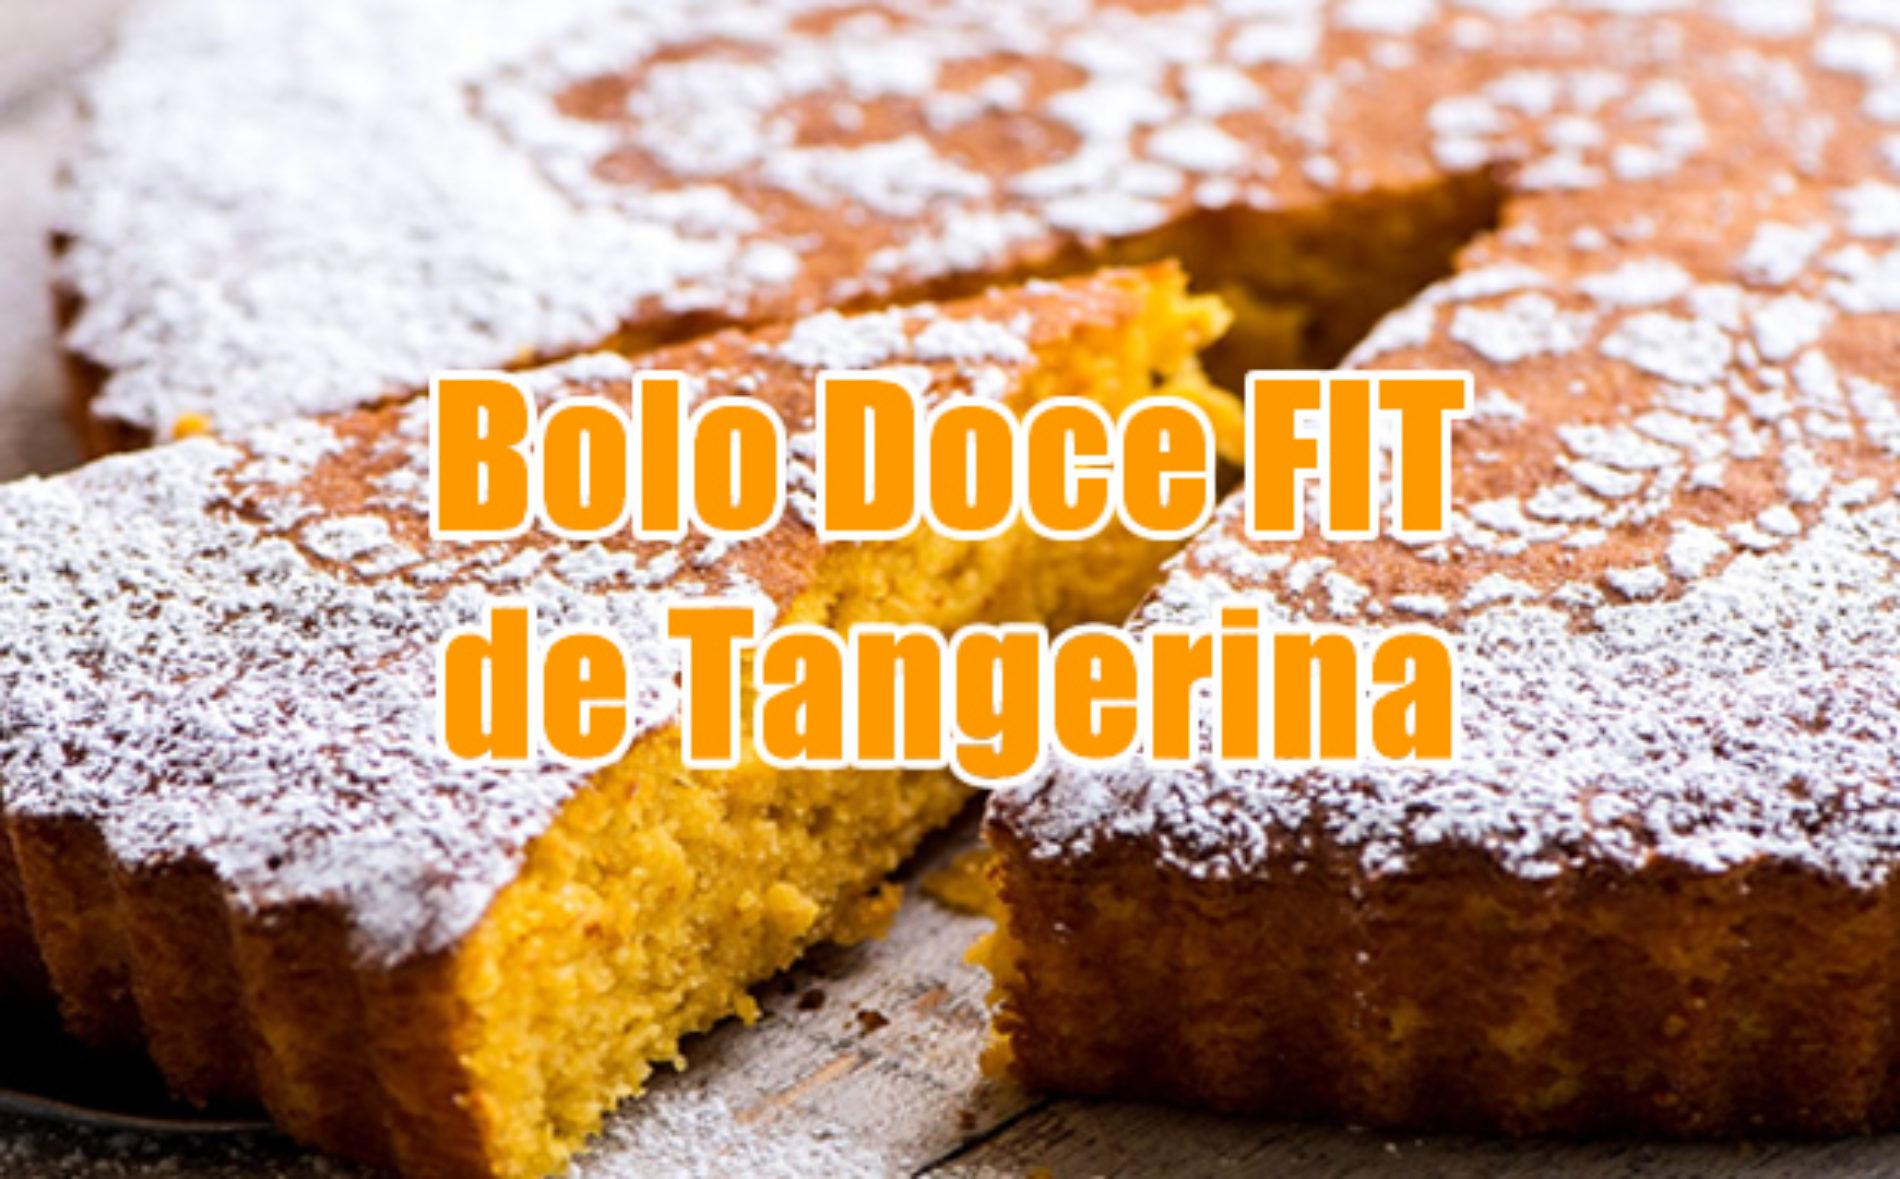 Bolo doce FIT integral de tangerina e açúcar orgânico